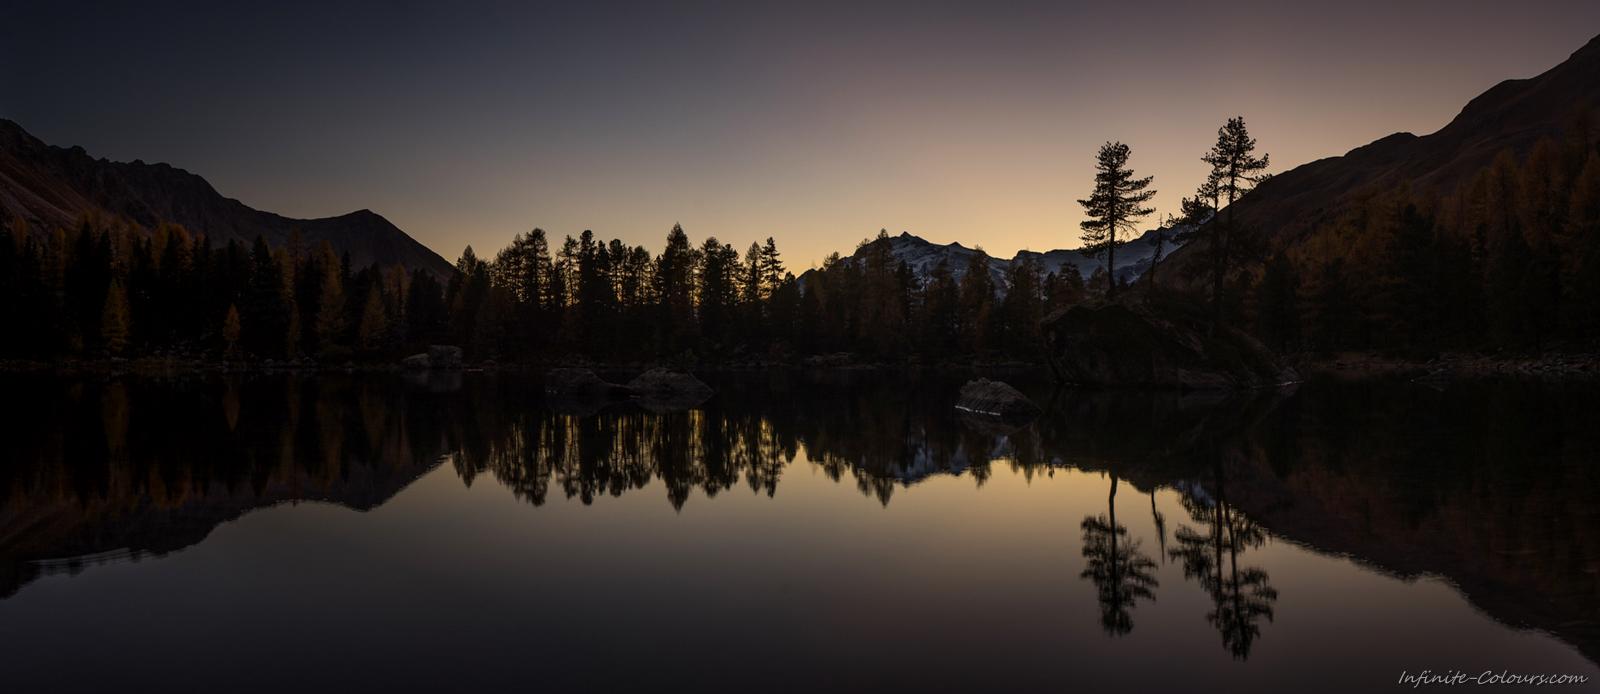 Lagh da Saoseo twilight Val Campo Sonnenuntergang Fotografie Photography Langzeitbelichtung Schweiz Bernina